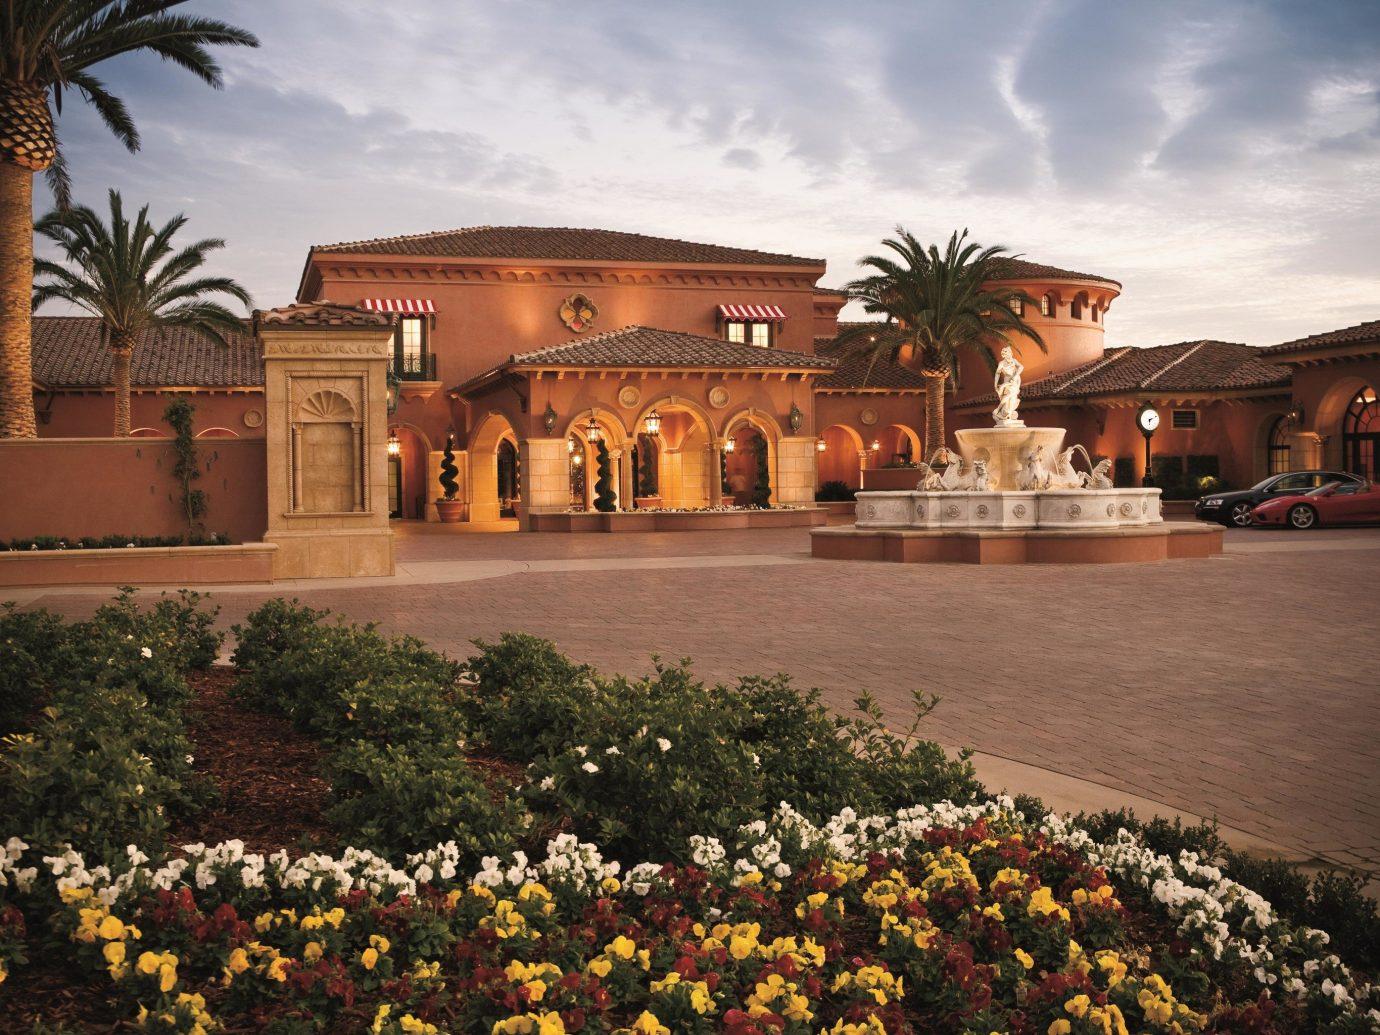 The Fairmont Grand Del Mar Hotel In San Diego, California